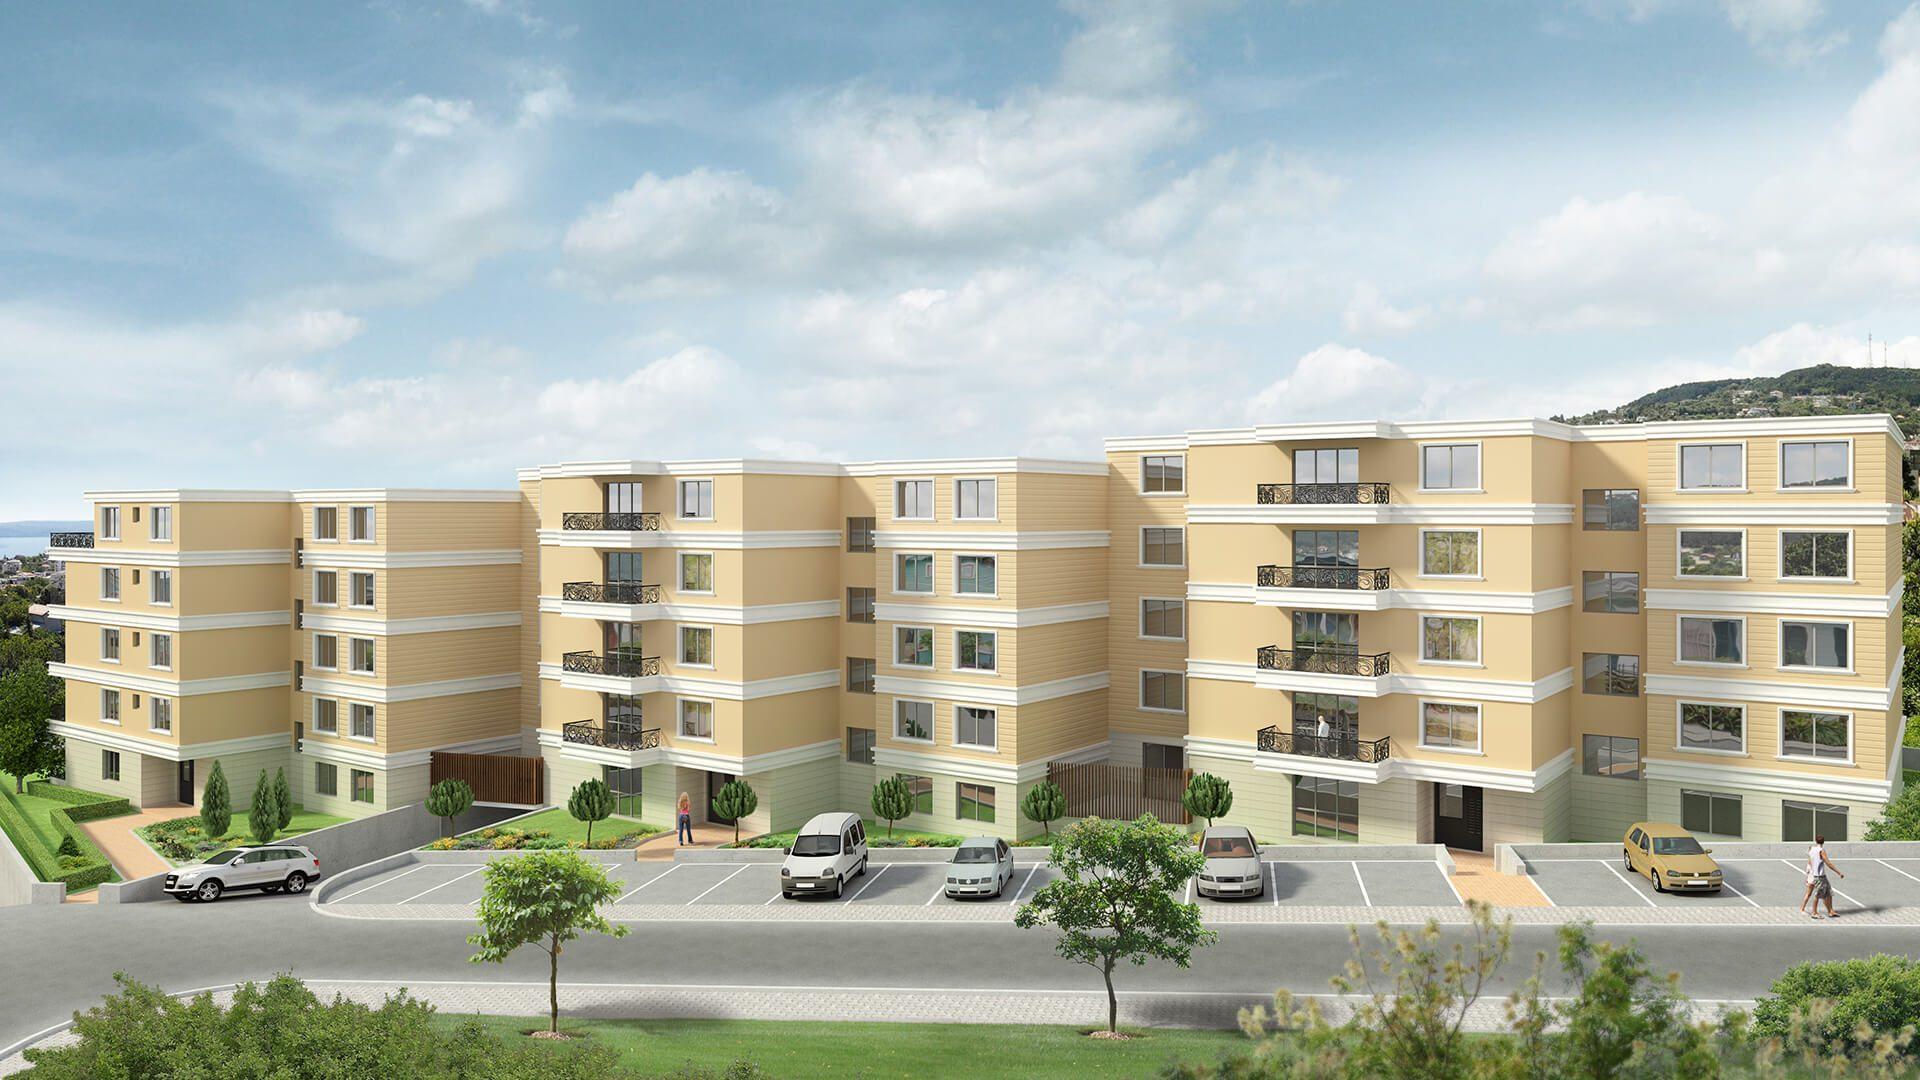 Виница Гардън - апартаменти във Виница - Варна